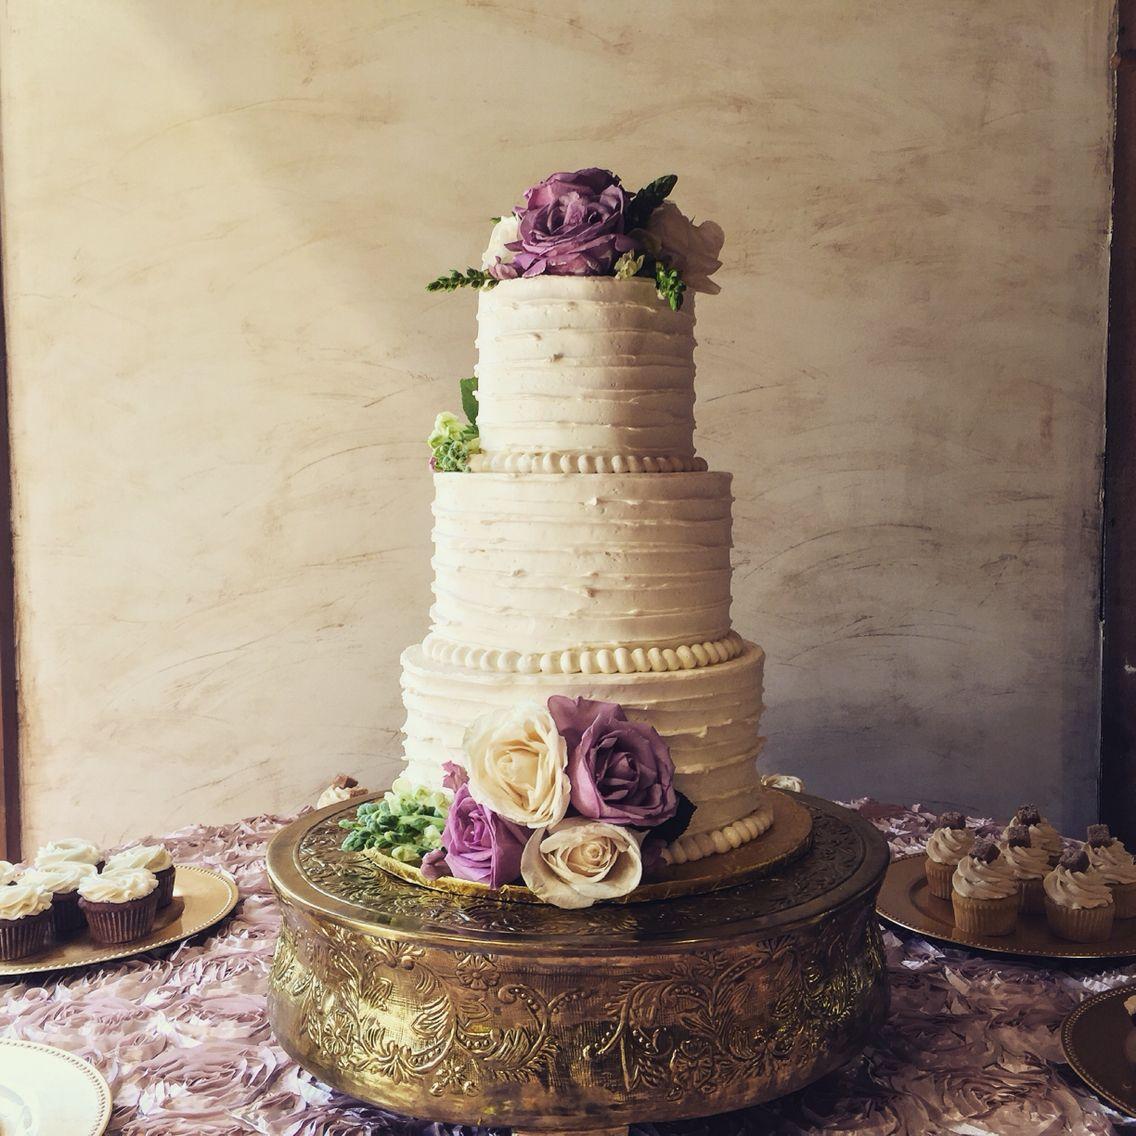 Fresh Flowers On The Wedding Cake Make It Pop By Cakeview Llc Venue Bella Rose Plantation In Lynchburg Va